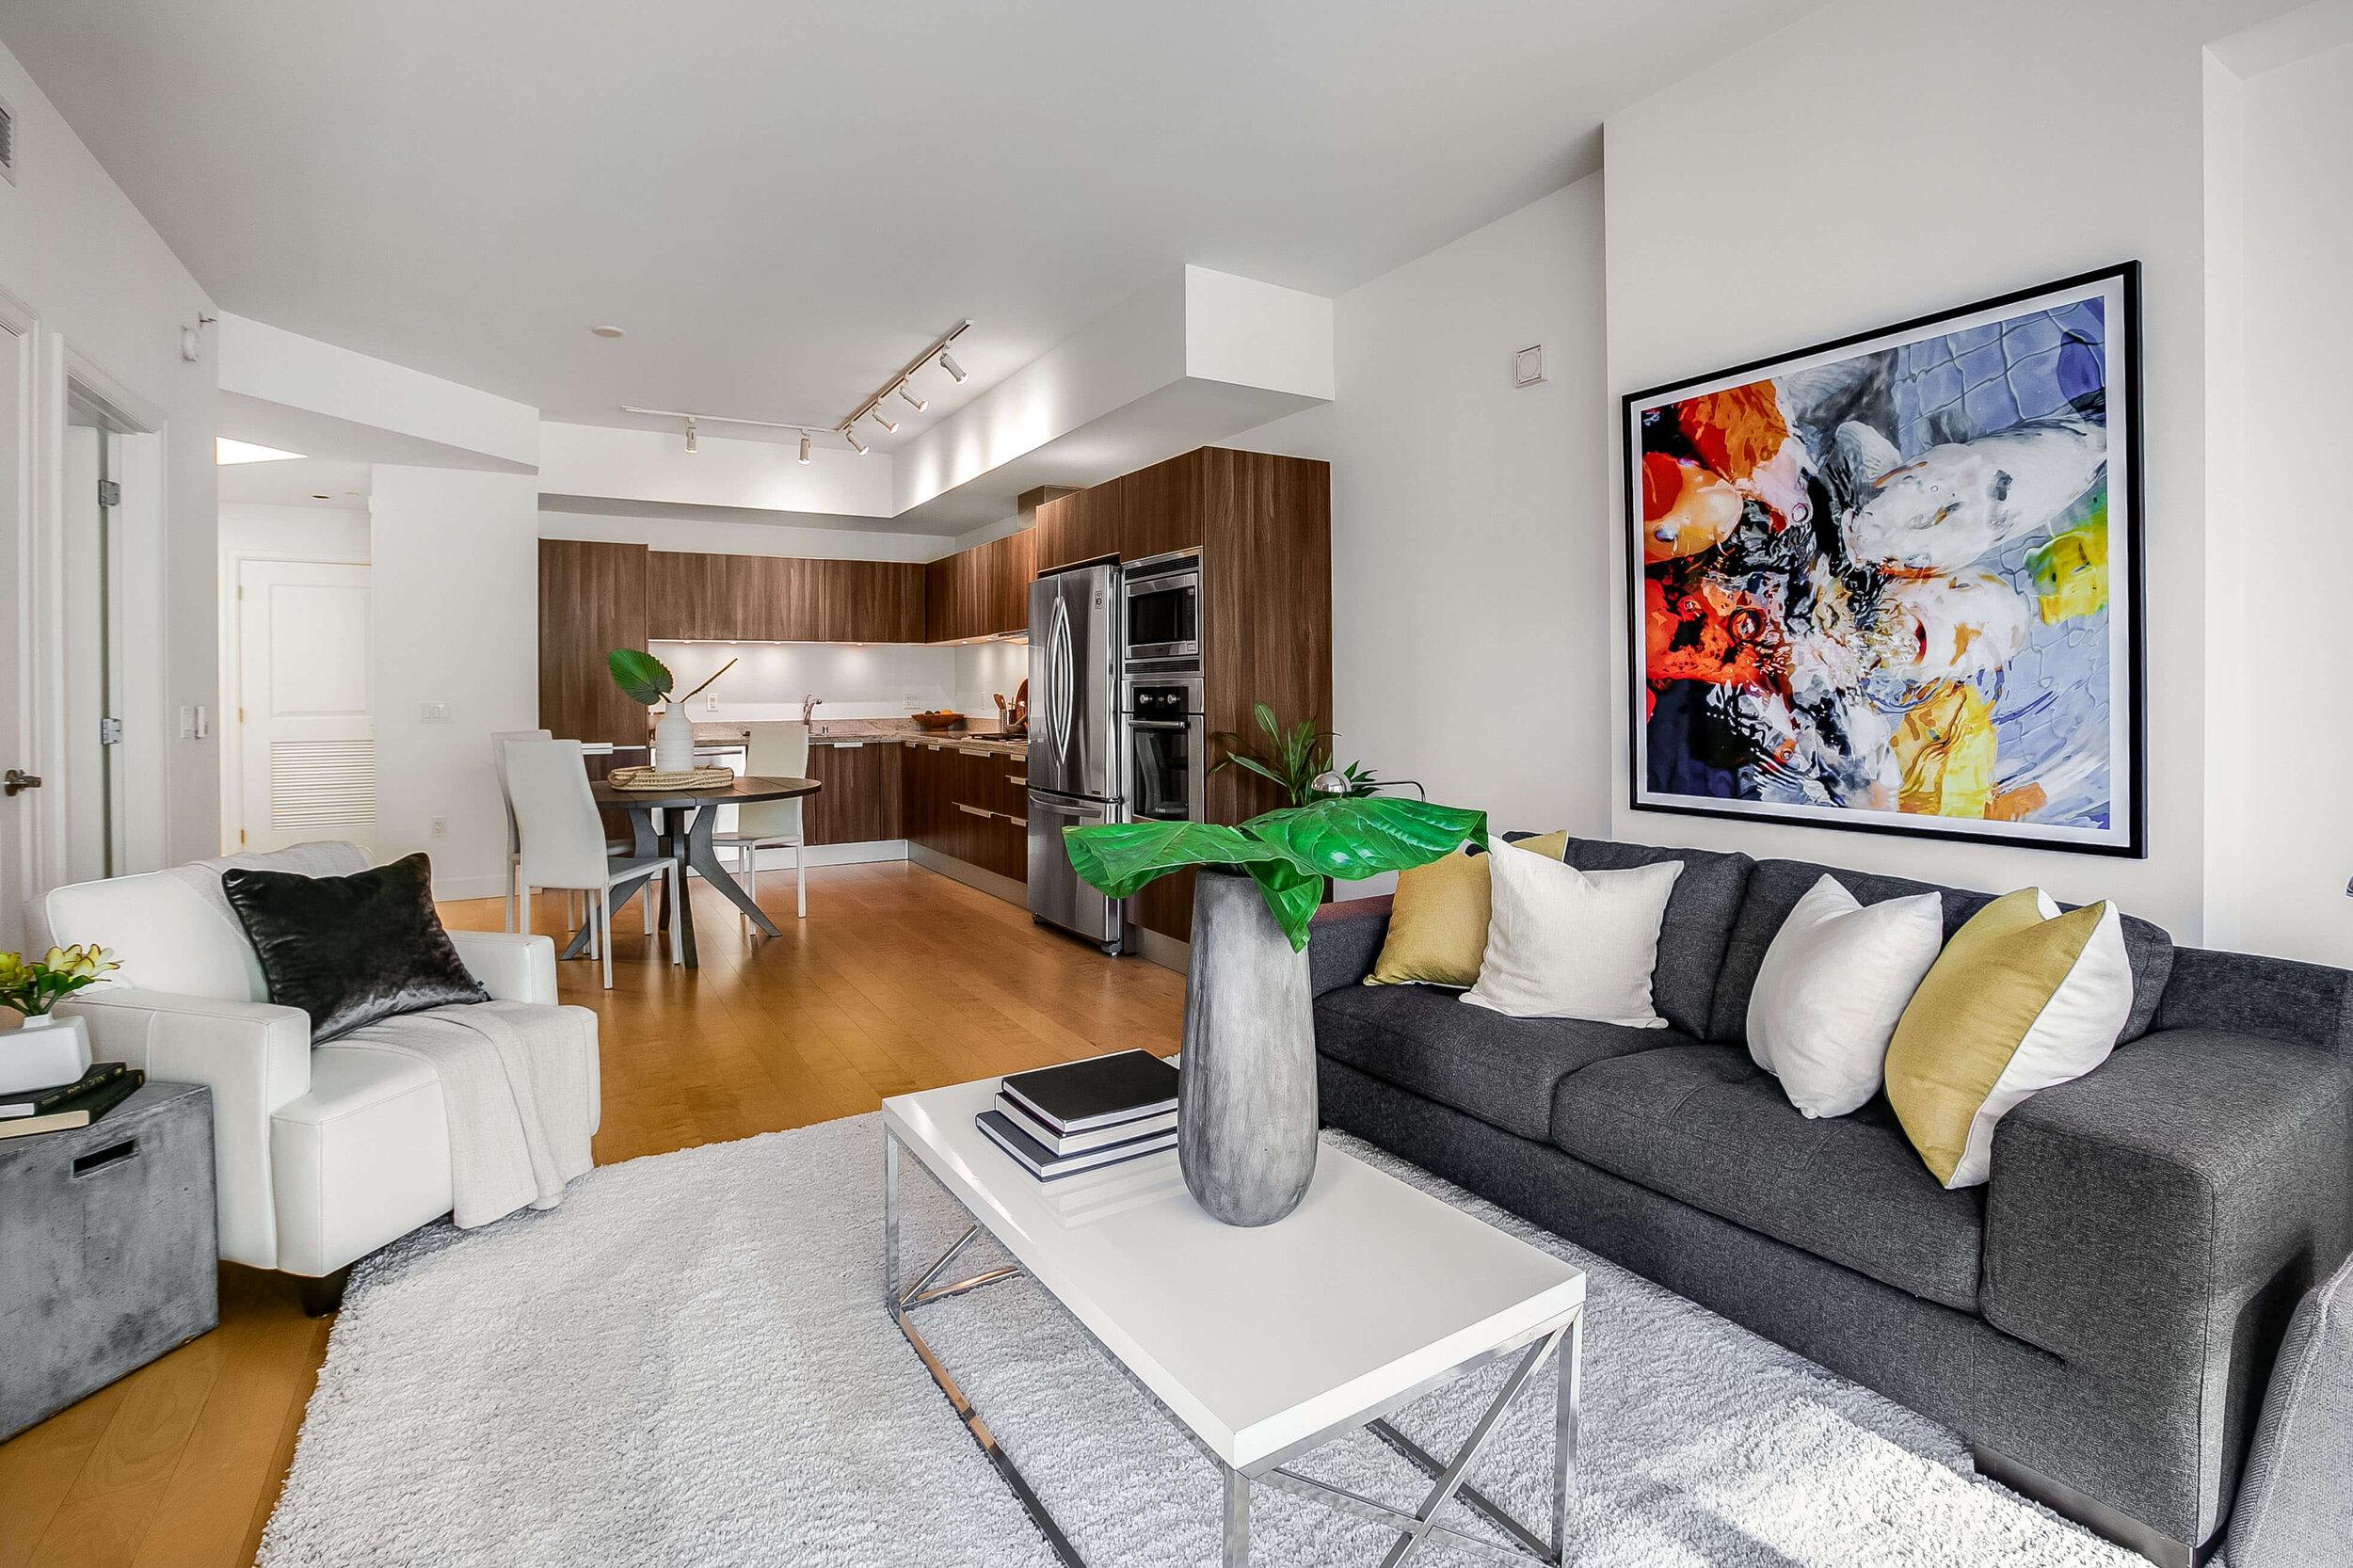 downtown-escala-luxury-high-rise-condo-for-sale.jpg